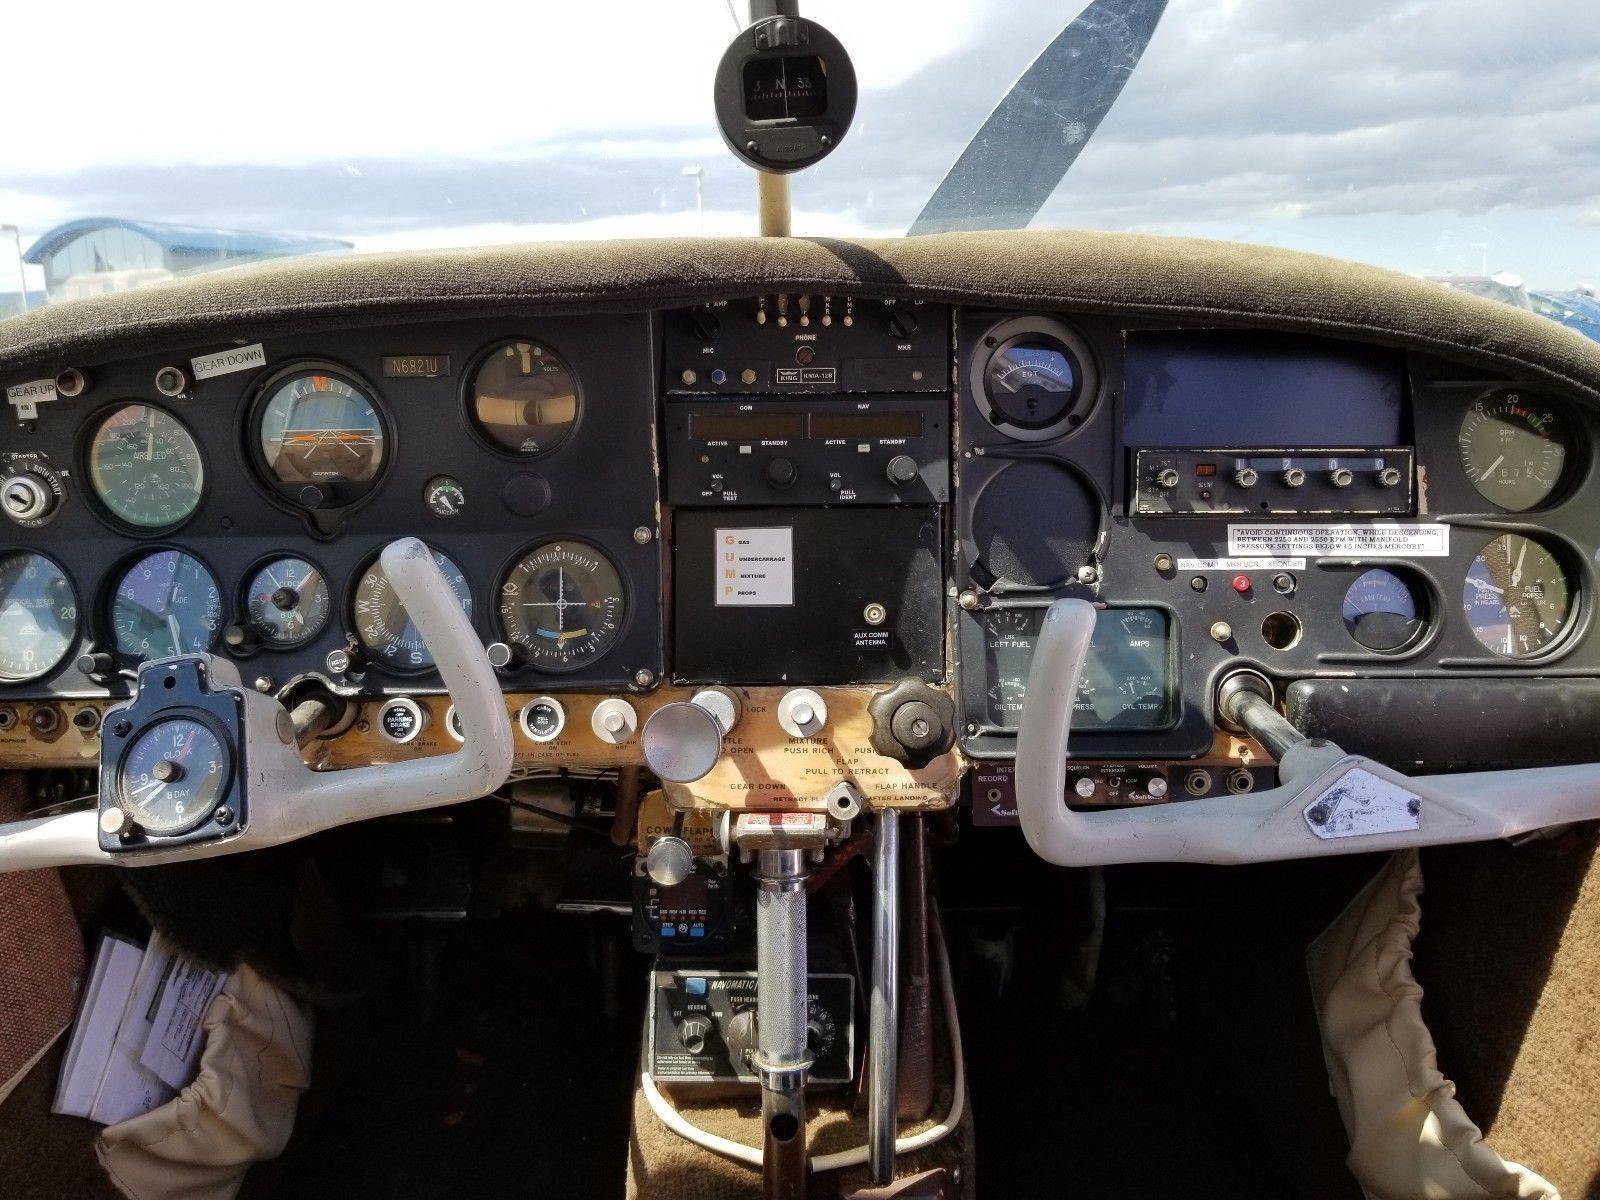 överhauled 1963 Mooney M20C aircraft